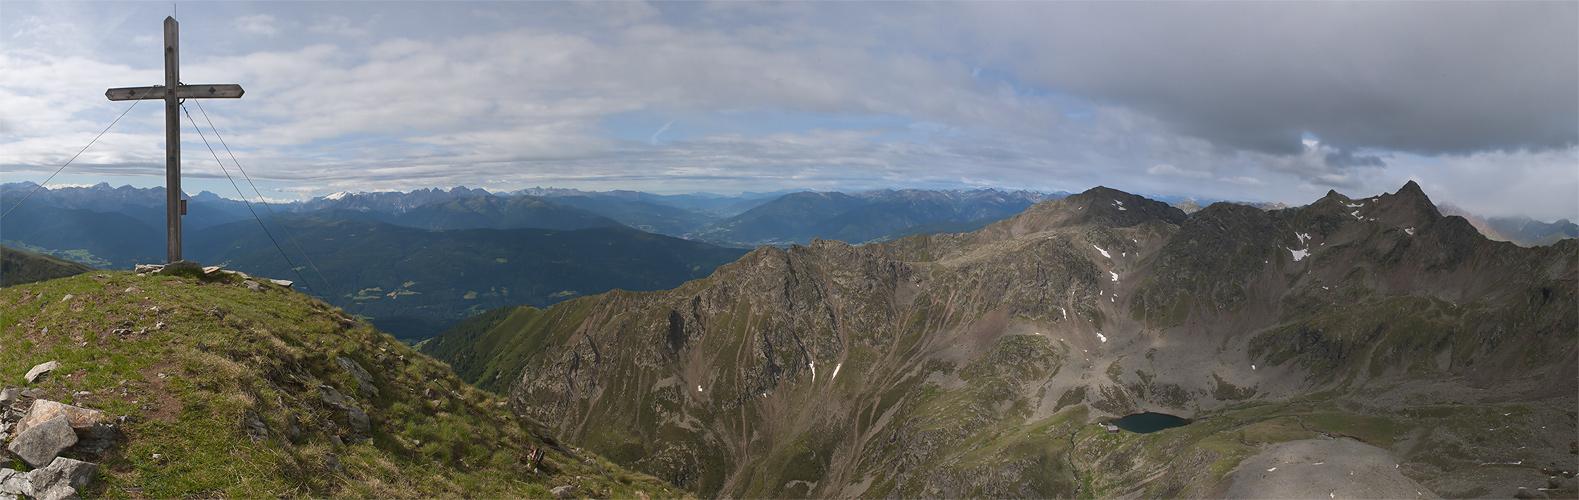 ... Kempspitze - Pfunderer Berge - Südtirol ...